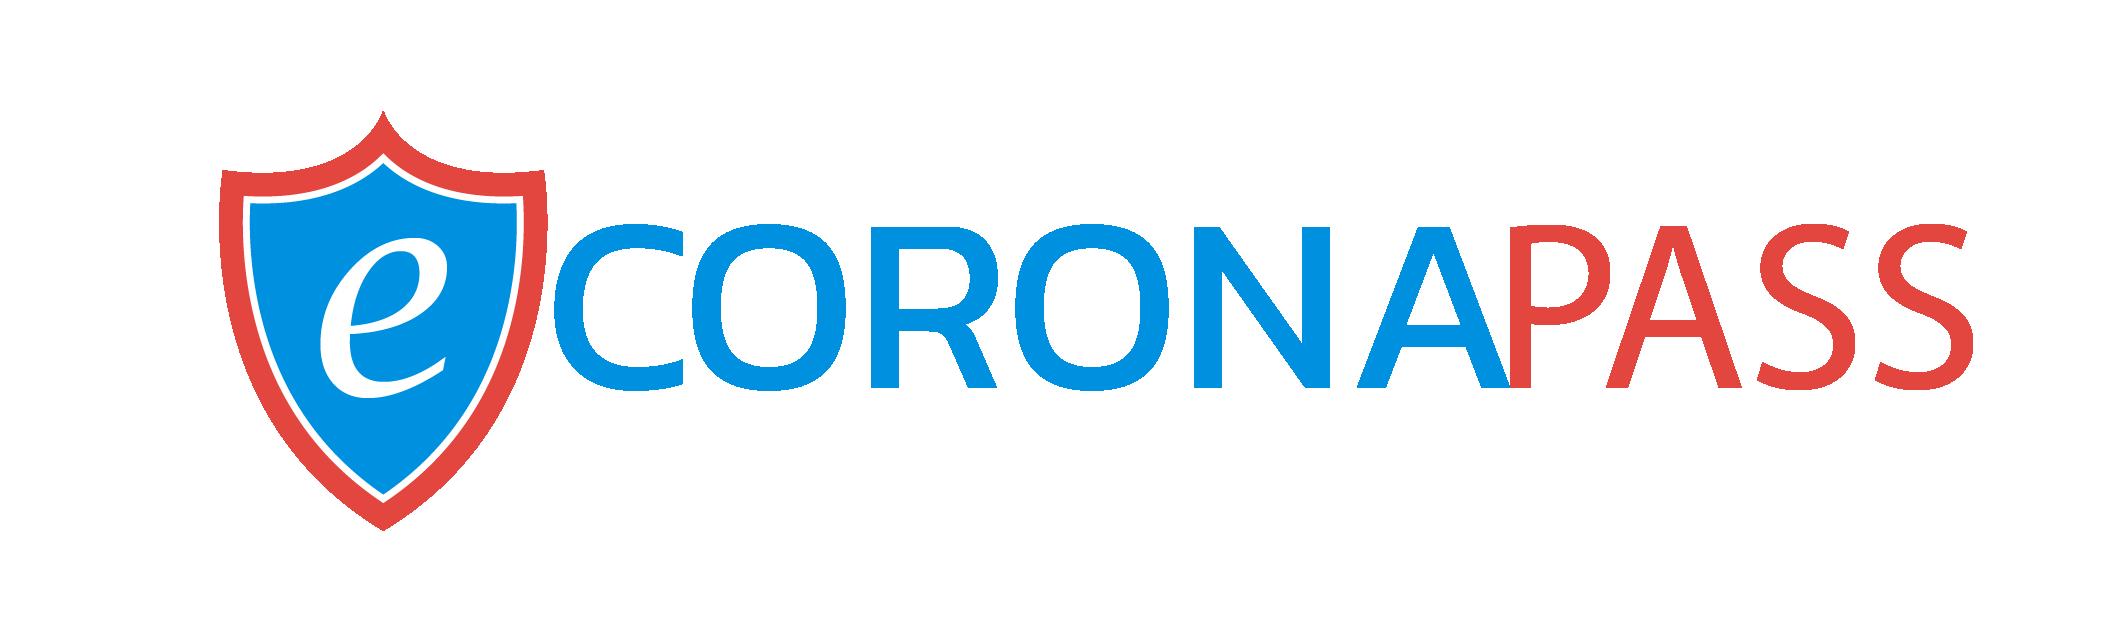 ecorona_pass_shield_seal_logo4-19